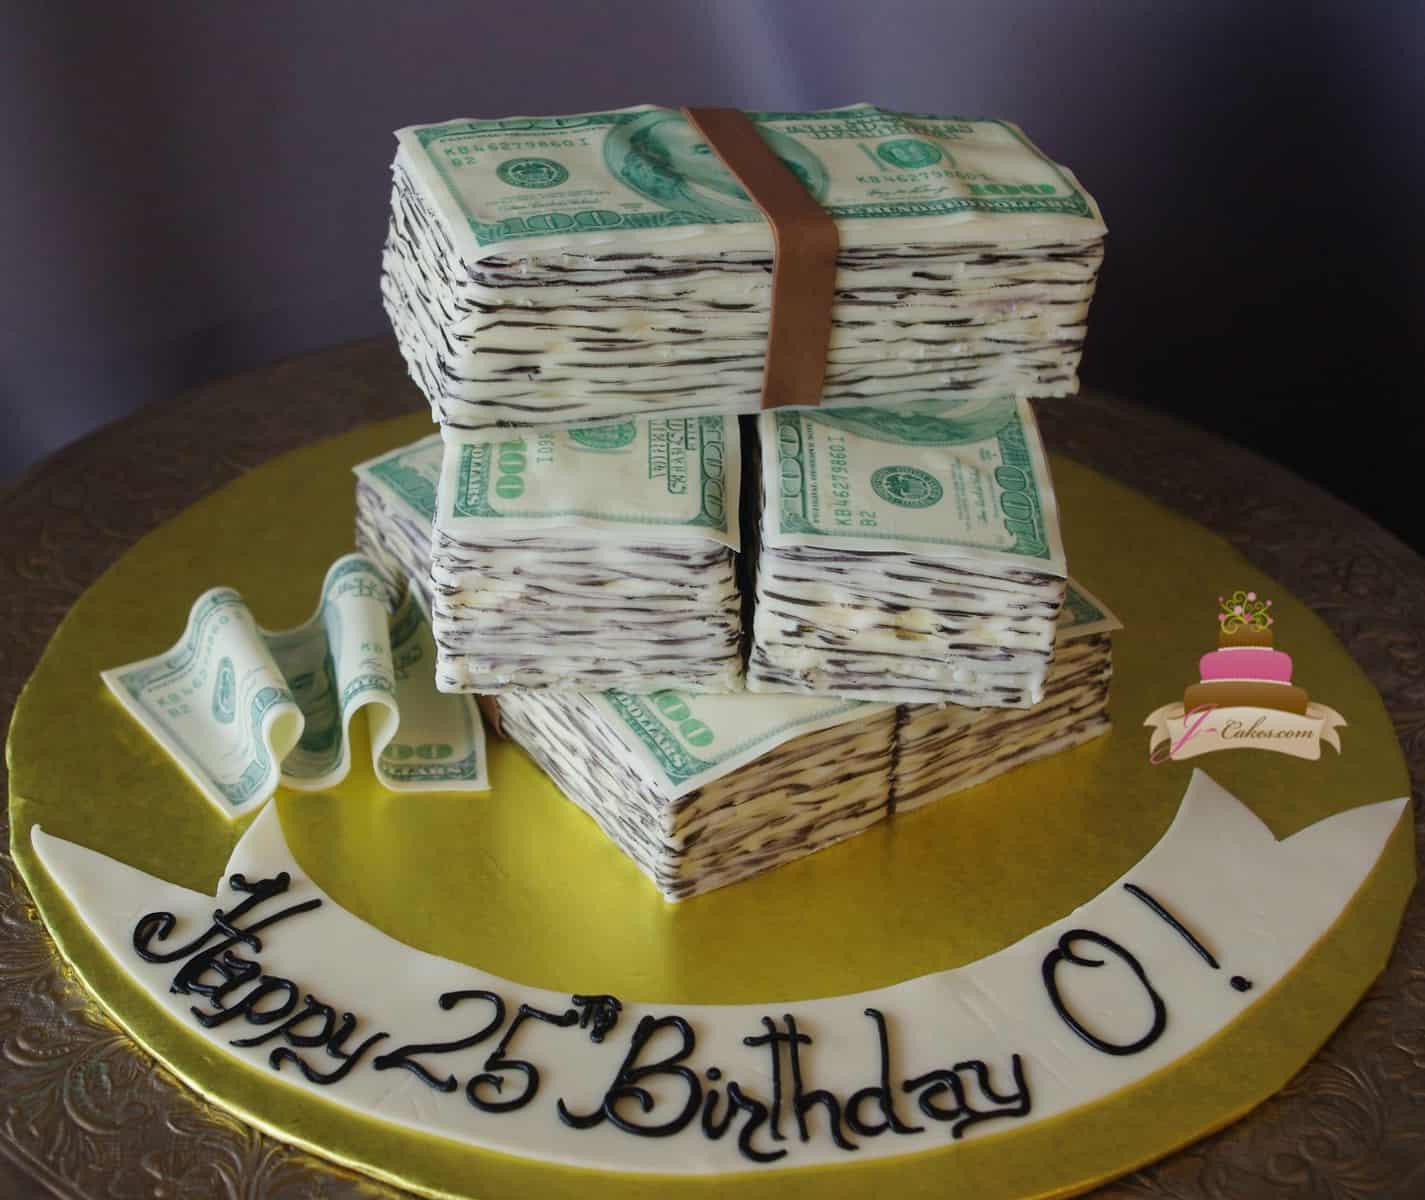 JCakes - Money birthday cake images